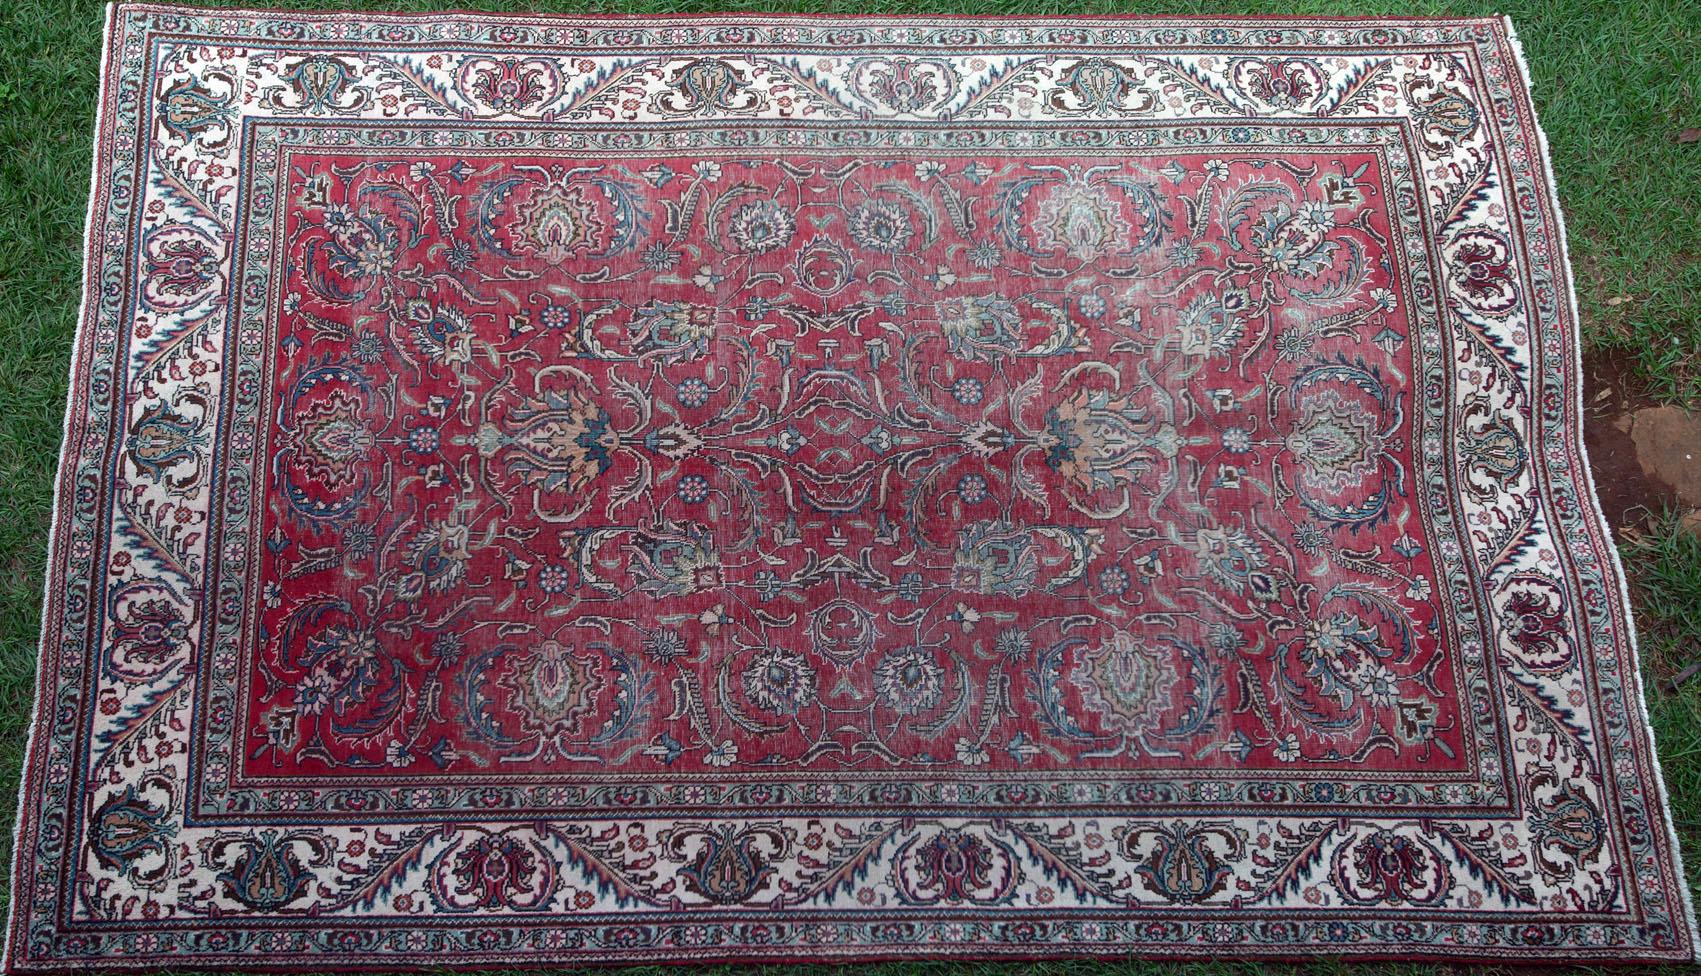 603 A Stylish Antique Tabriz Persian Carpet Www Bagface